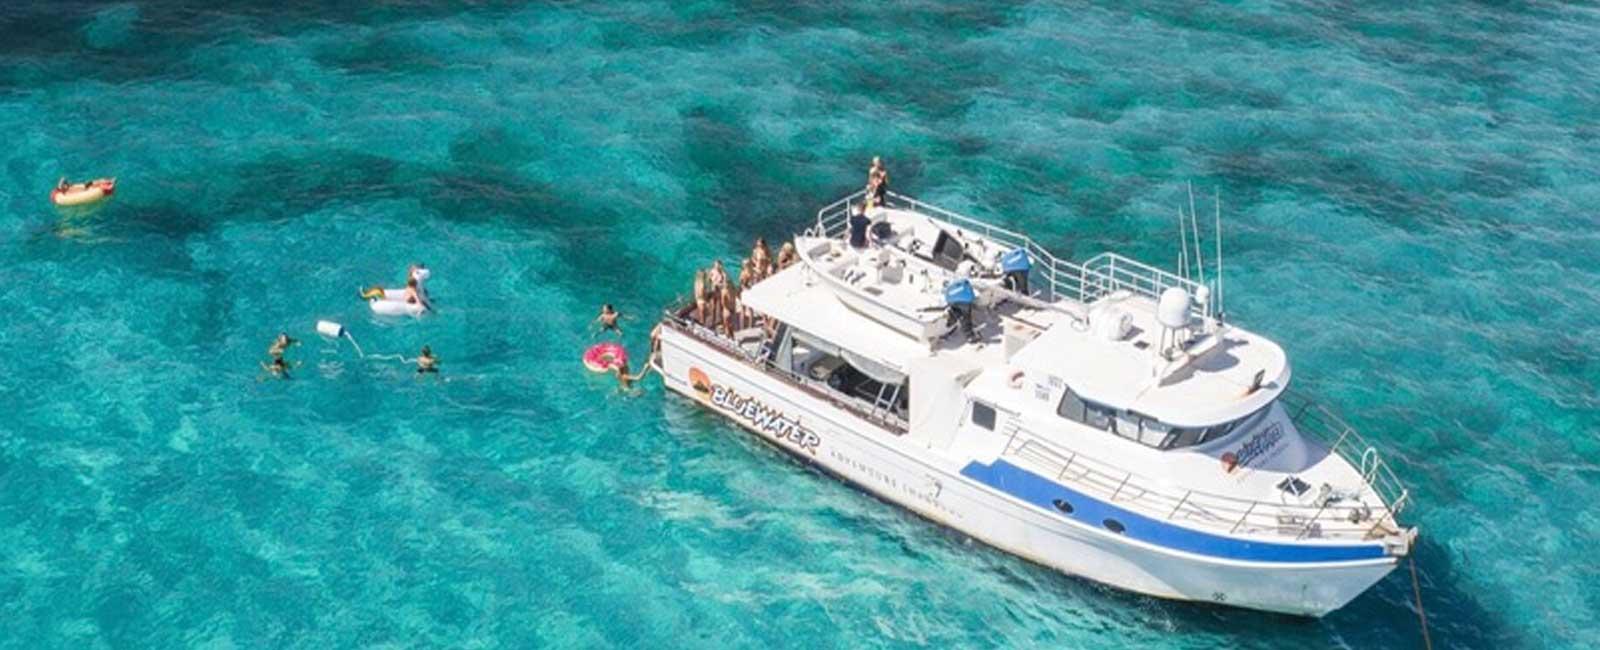 GLENALAN-aerial-photo-perth-boat-charter-hire-1